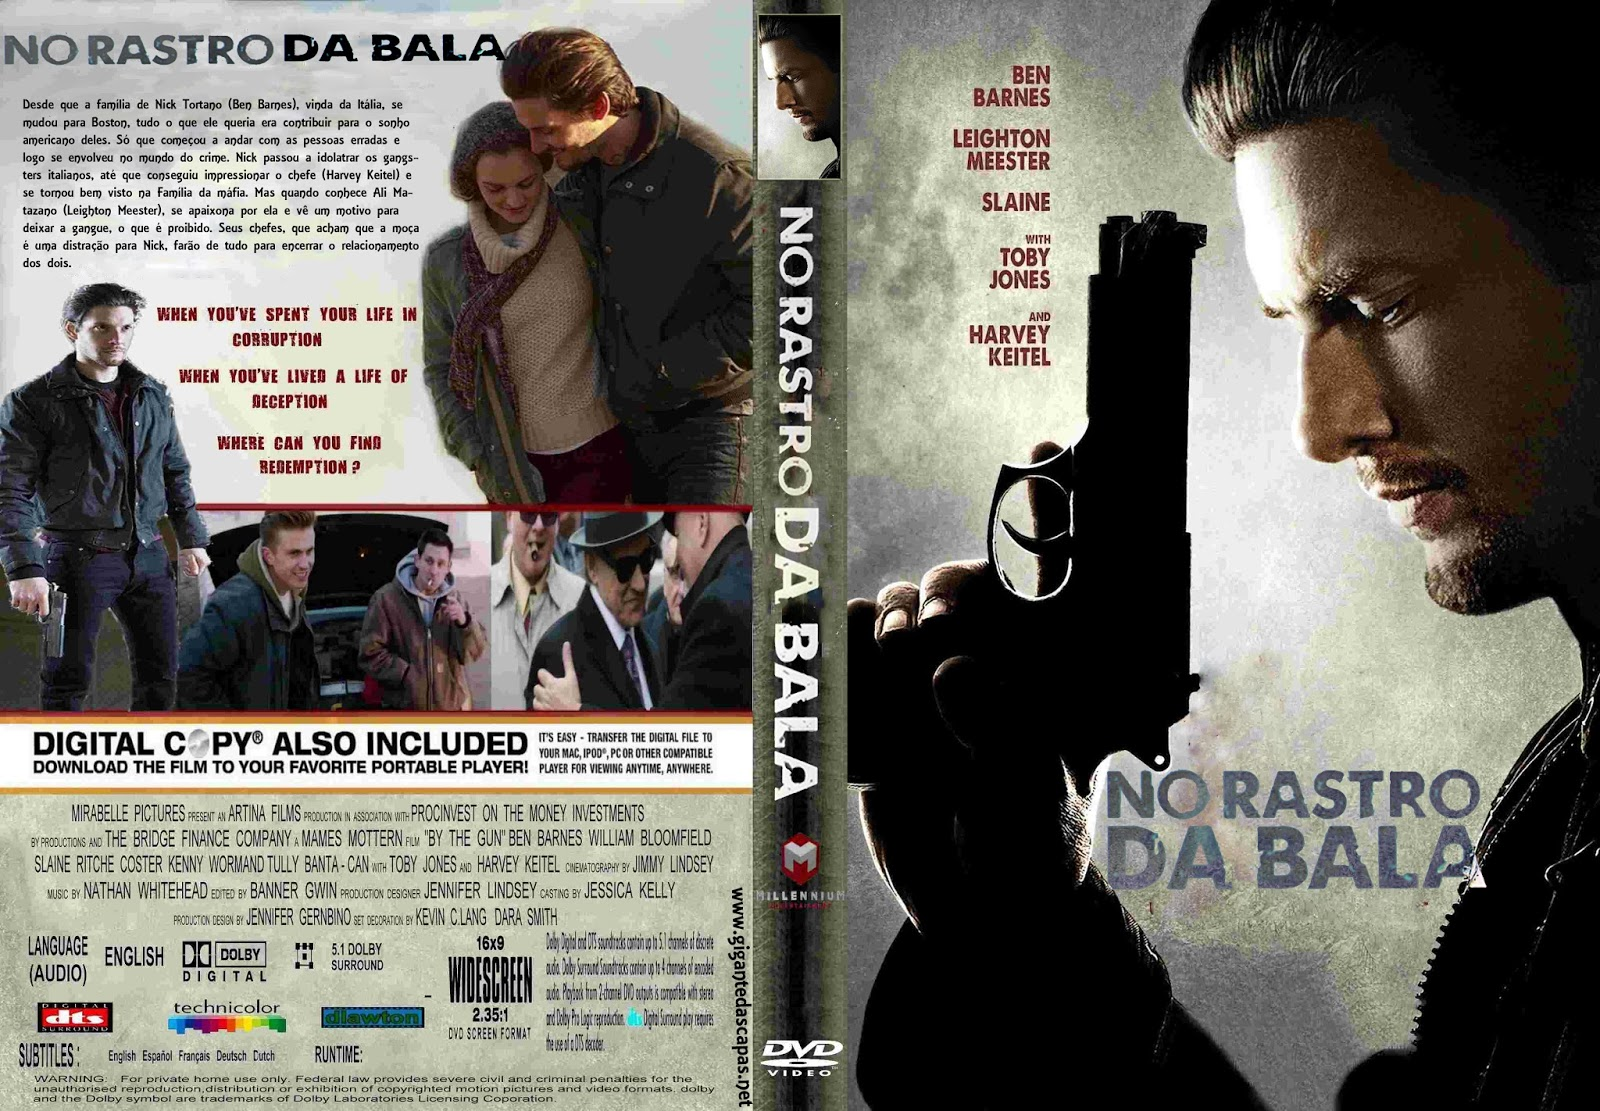 No Rastro da Bala BDRip XviD Dual Áudio No 2Brastro 2Bda 2BBala 2B 25282015 2529